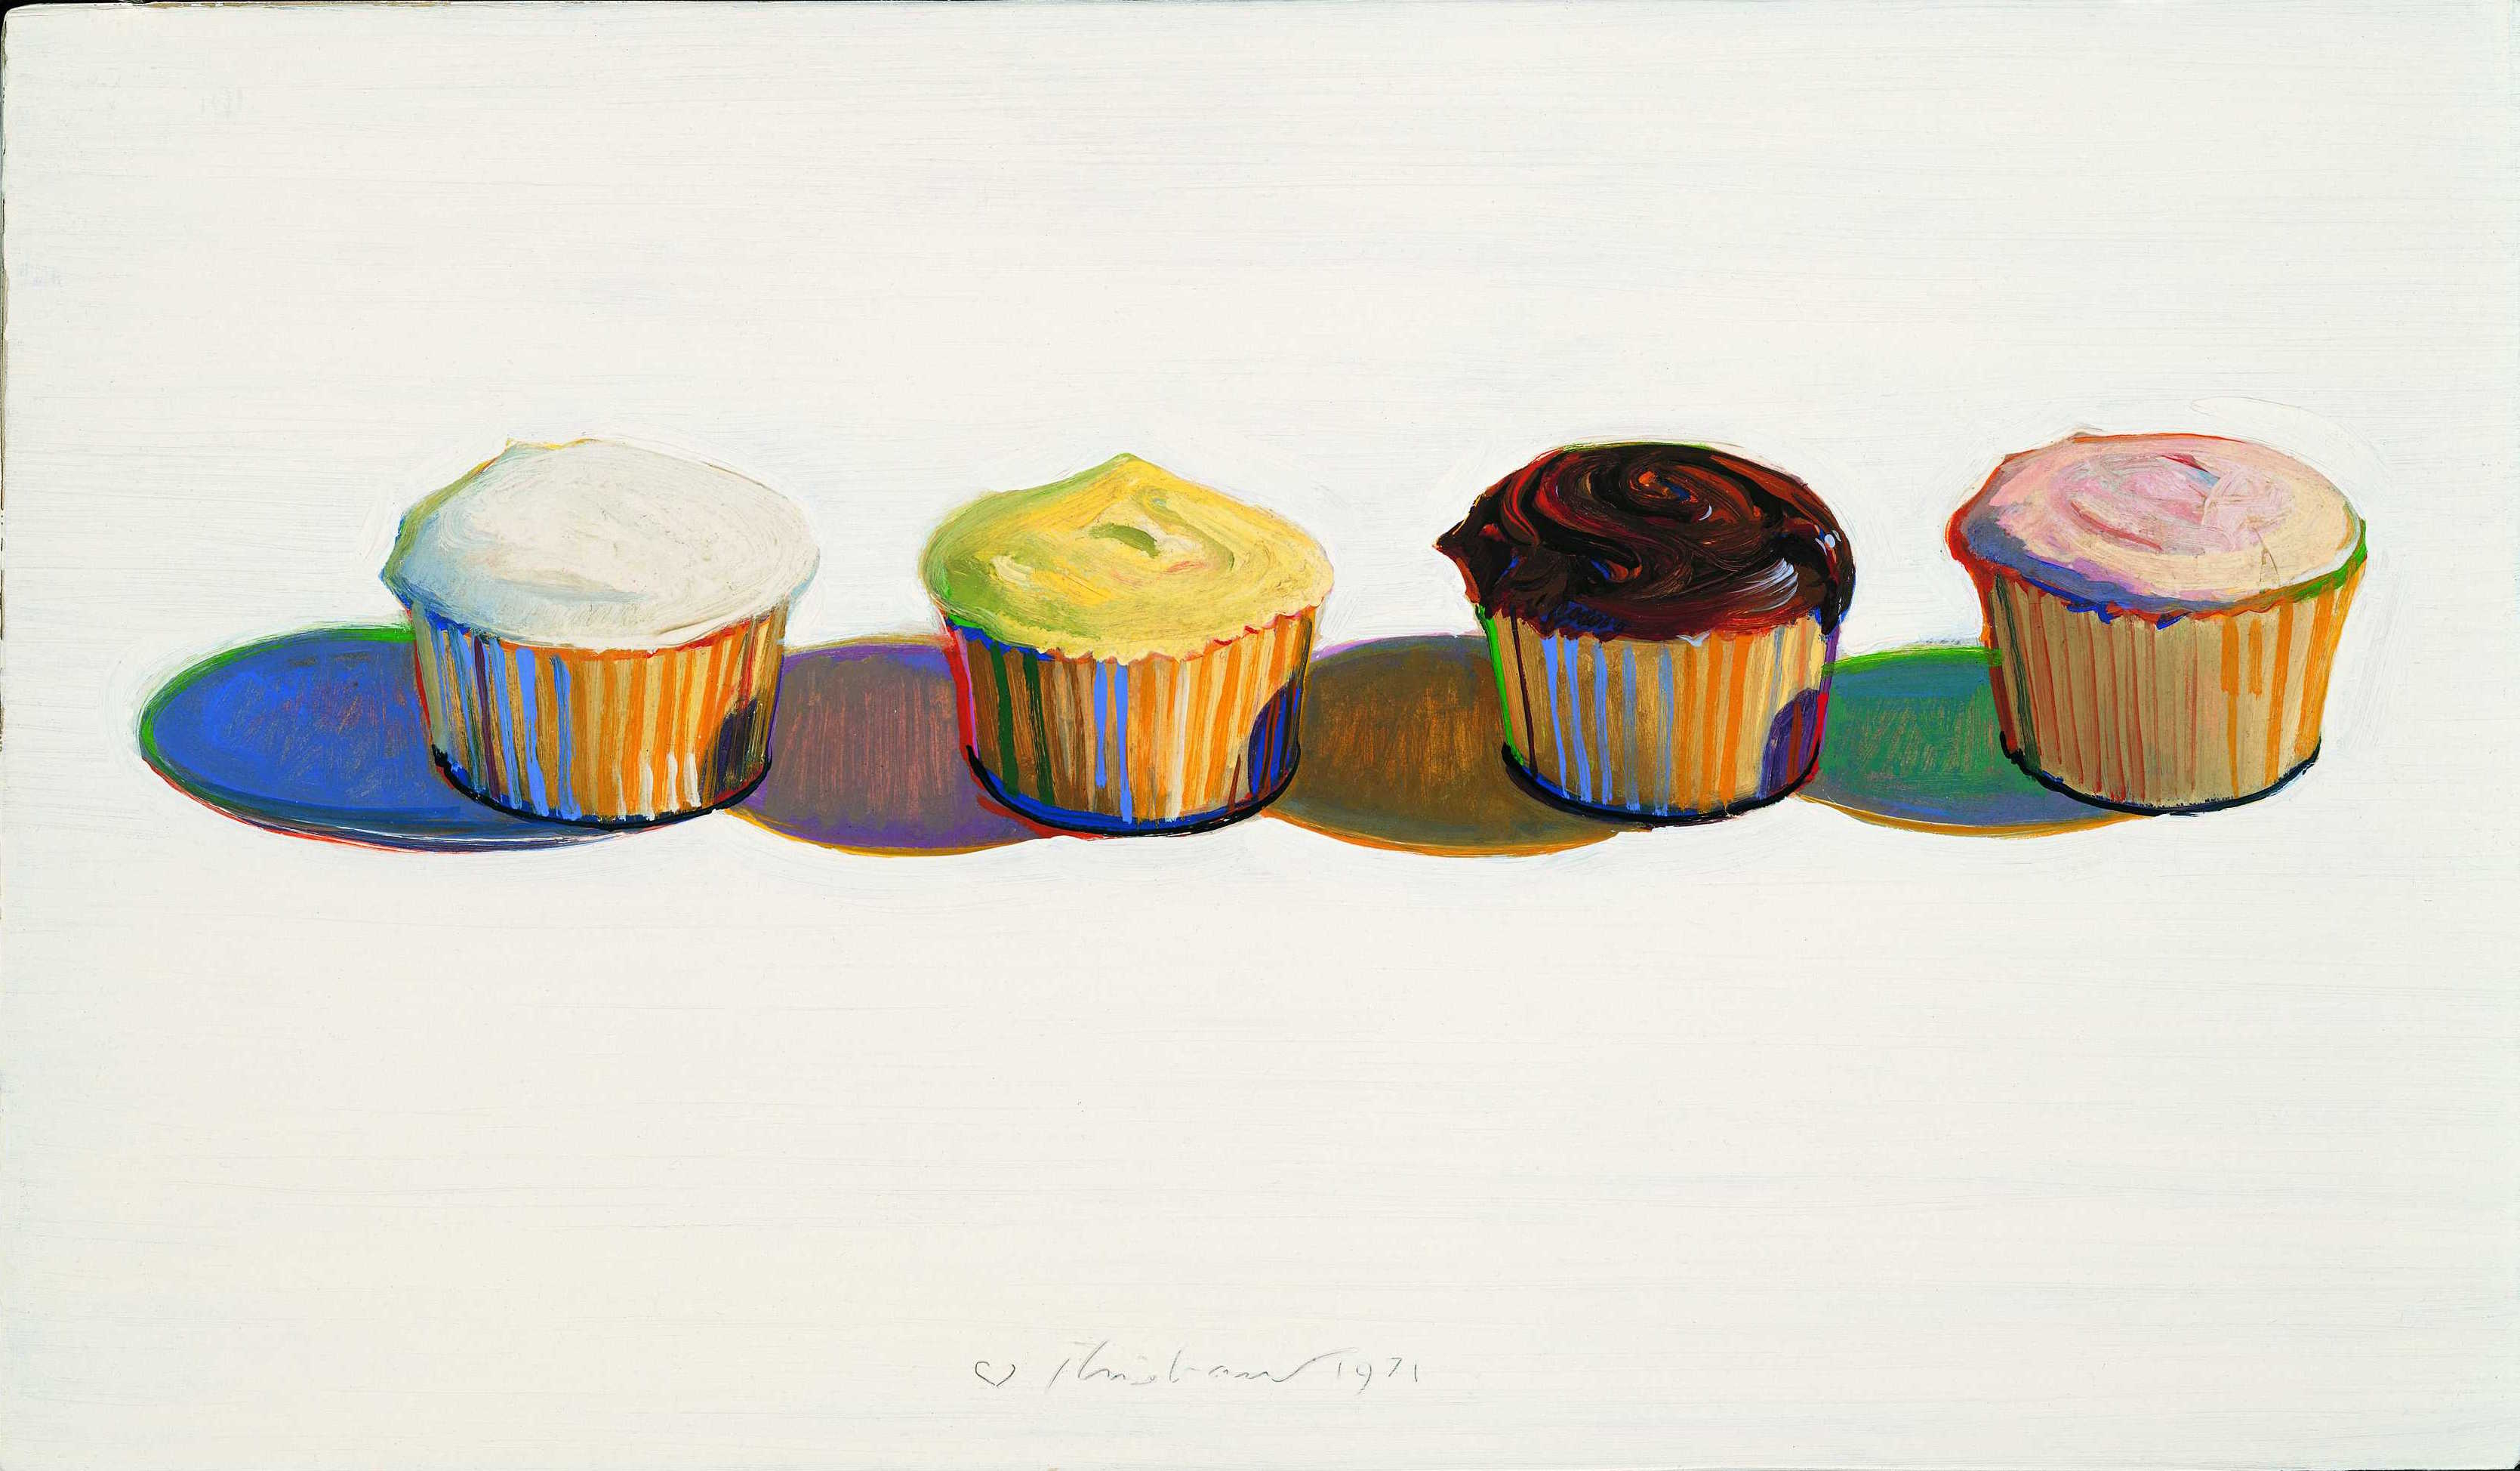 Wayne Thiebaud , Four Cupcakes, 1971 (Bologna Museum of Modern Art / Morandi Museum)